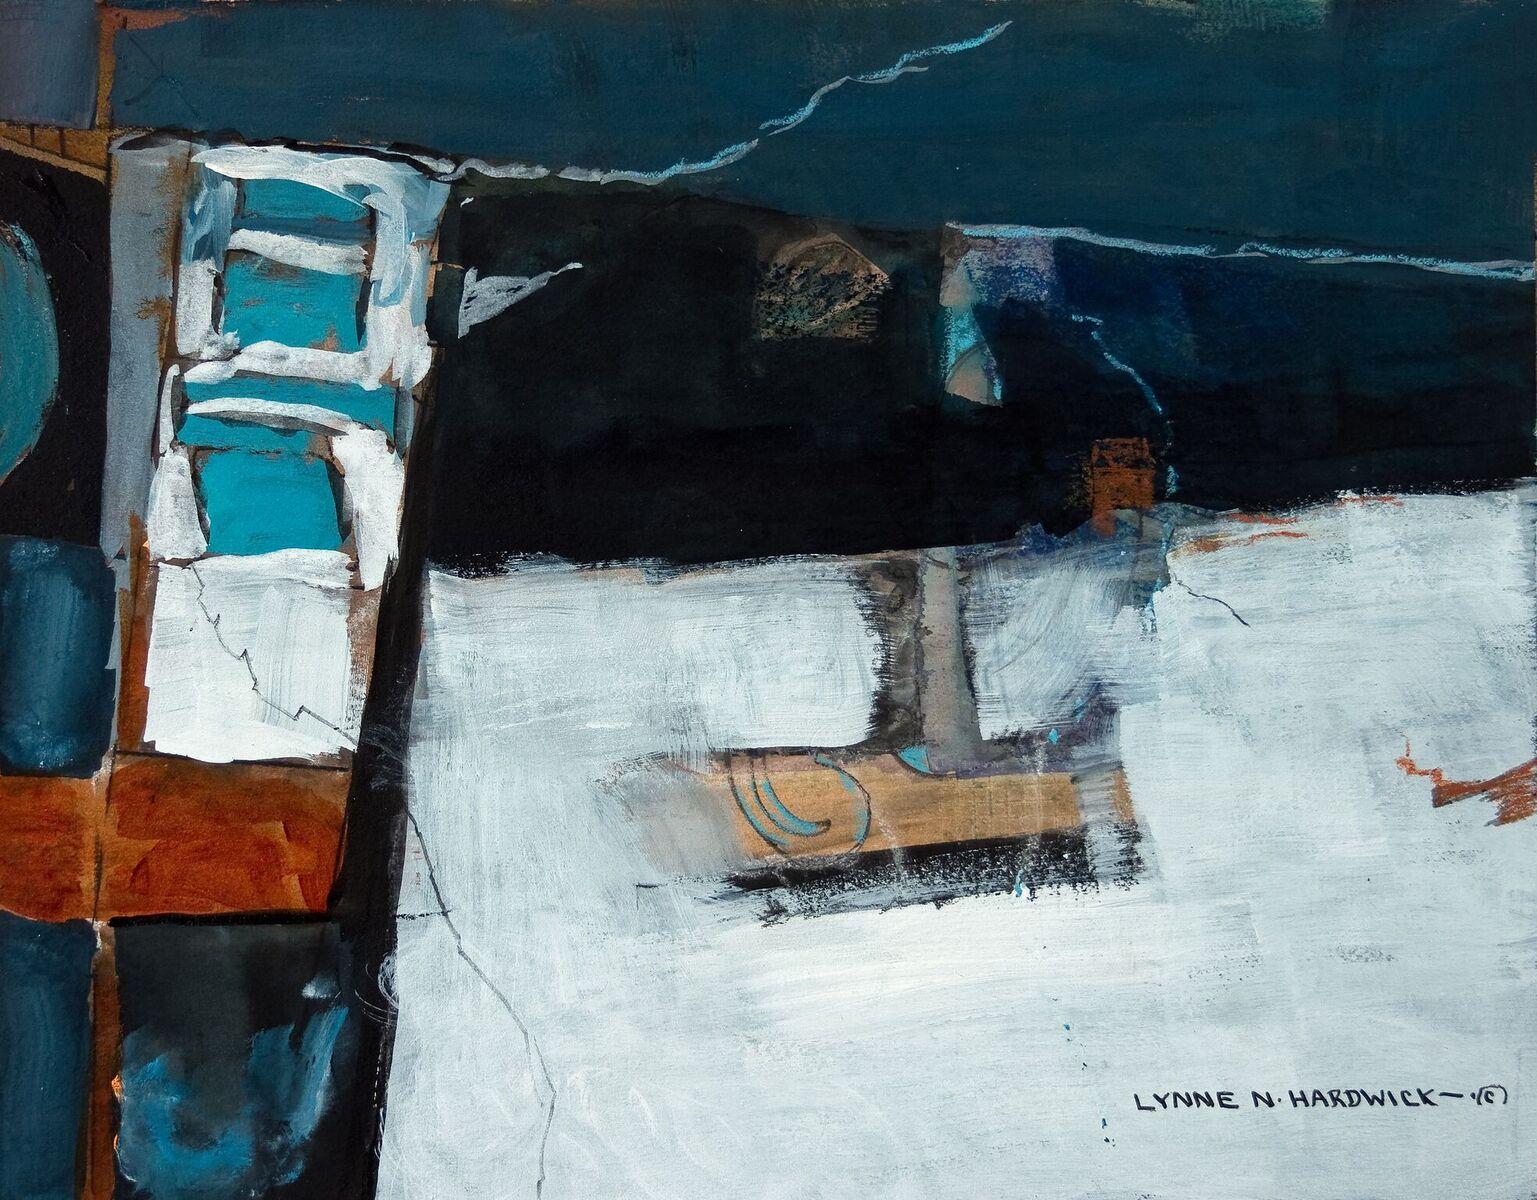 Lynne Hardwick, TumulusIX , Mixed Media, 24x27